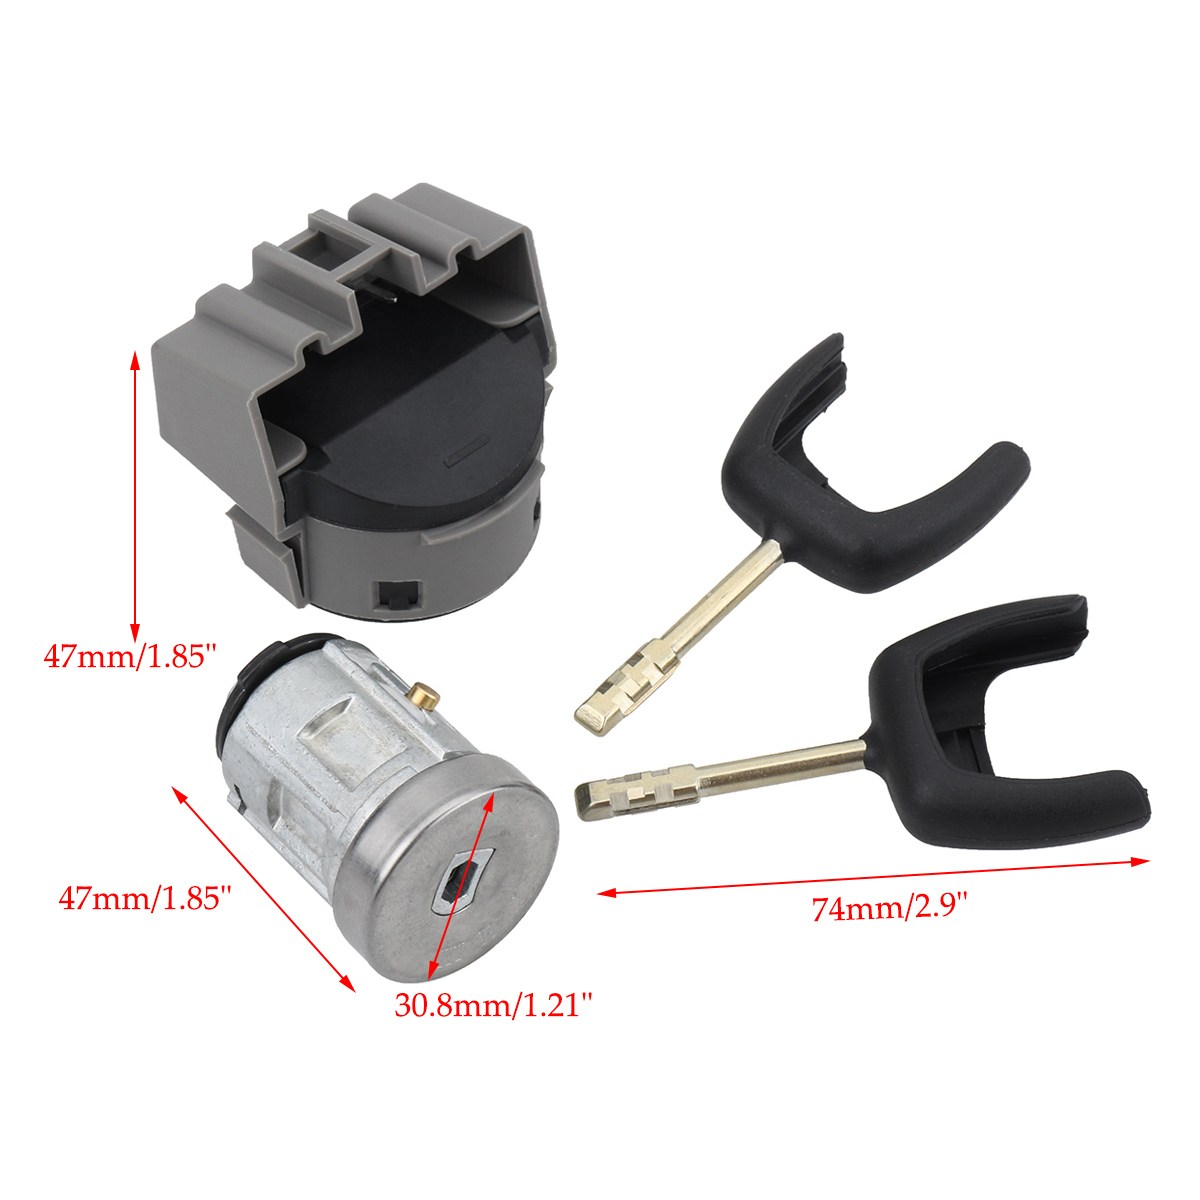 medium resolution of vehicle parts accessories brand new starter ignition switch wiring ford transit mk3 mk4 mk5 1985 2000